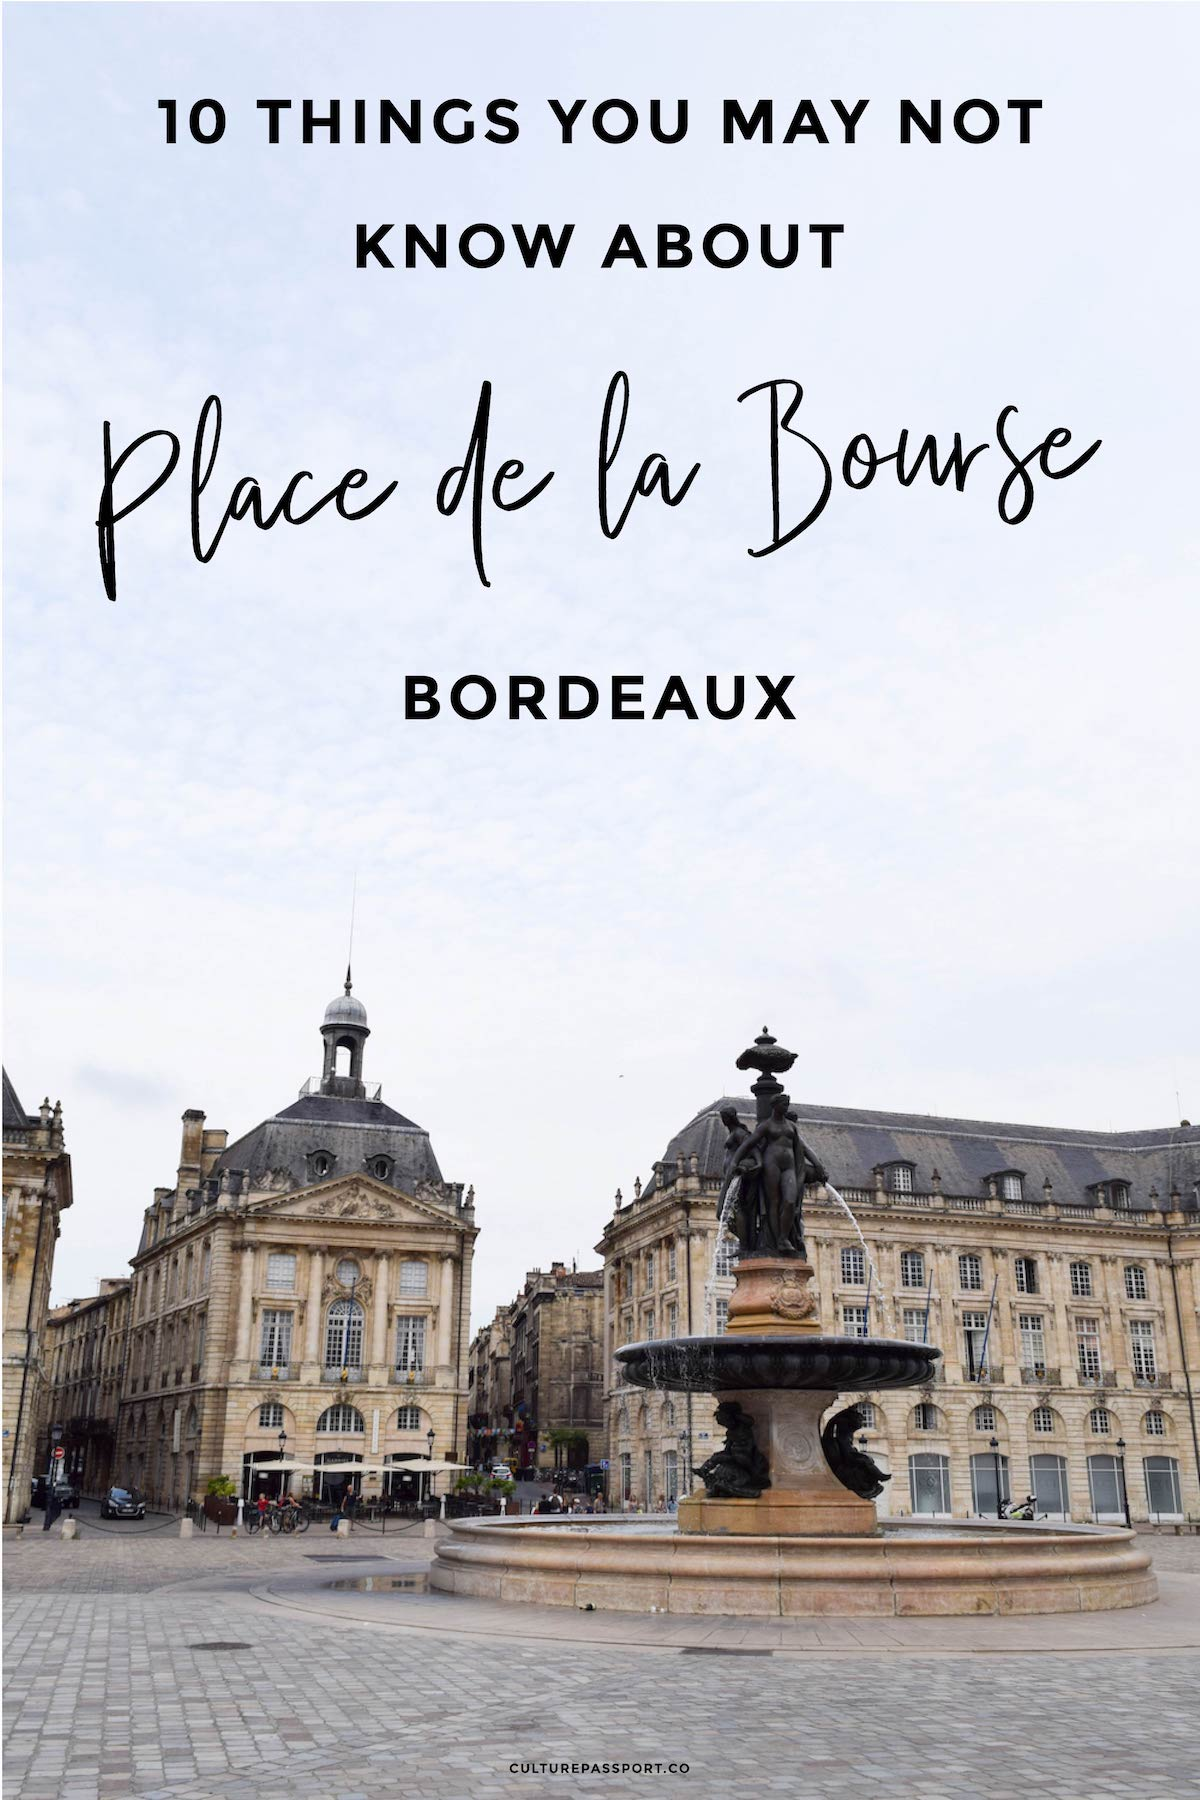 Things You May Not Know About Place de la Bourse Bordeaux